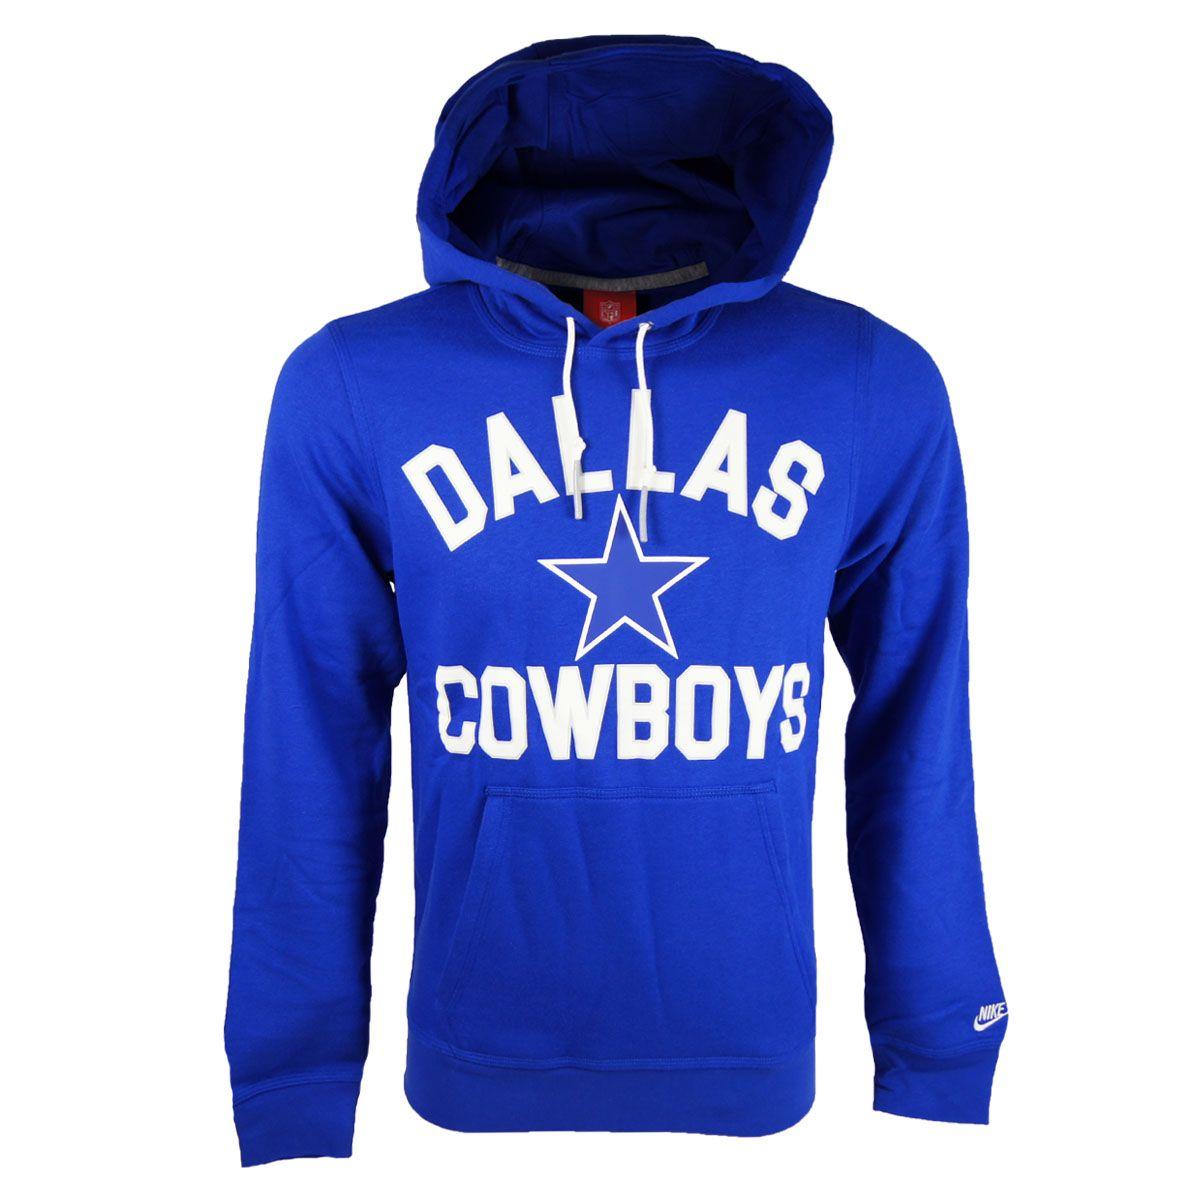 check out 0f38d c094a Dallas Cowboys Hoodie | Dallas Cowboys Shop | Dallas cowboys ...